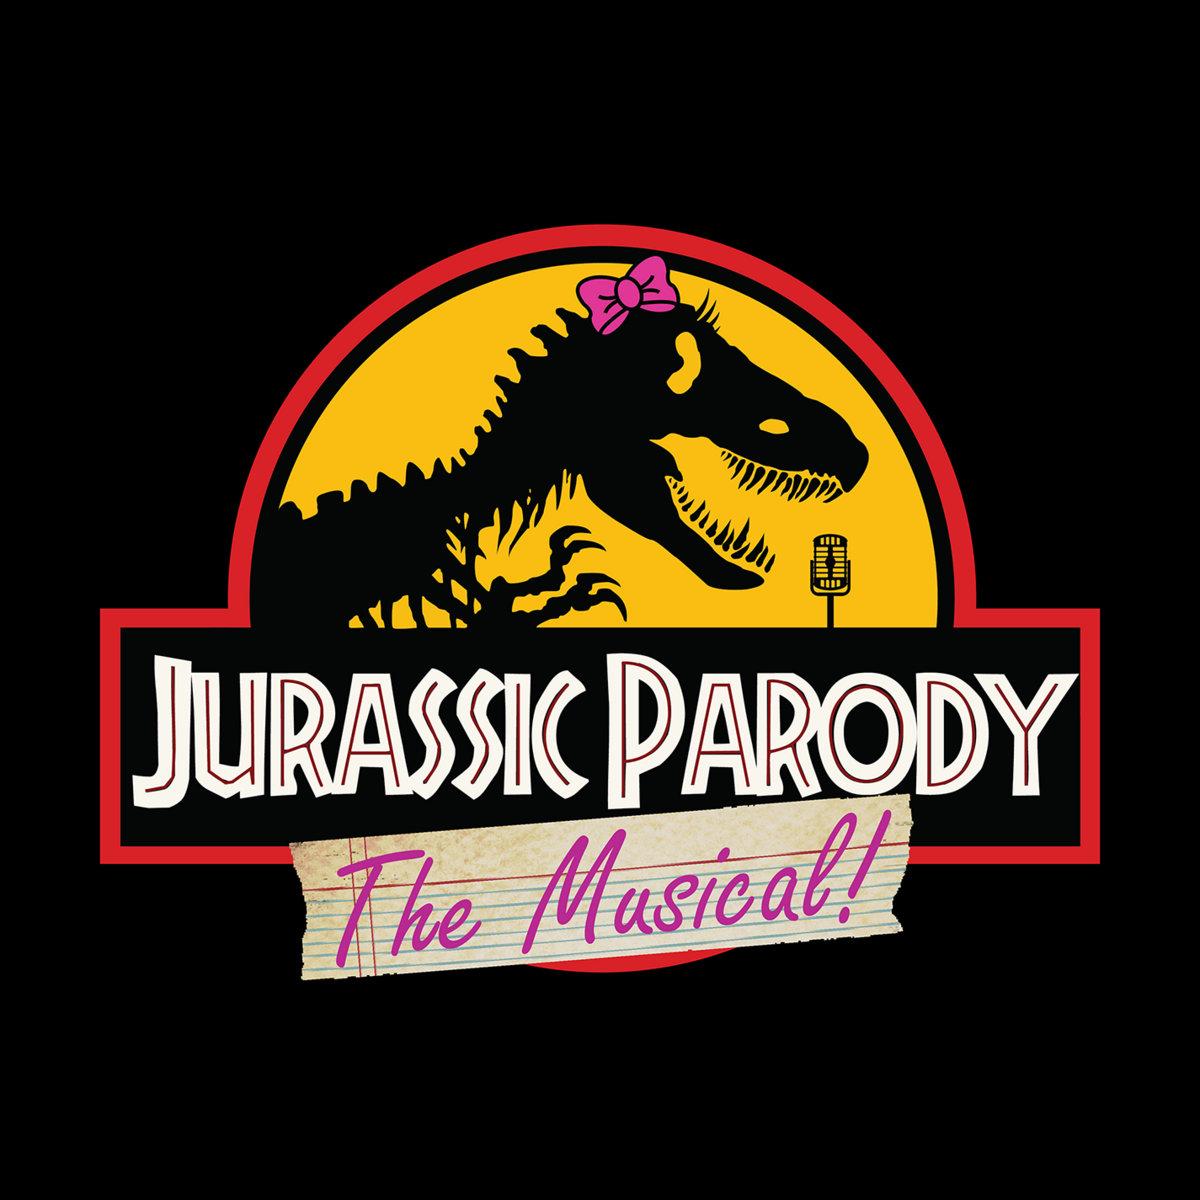 jurassic parody the musical cast recording geekenders